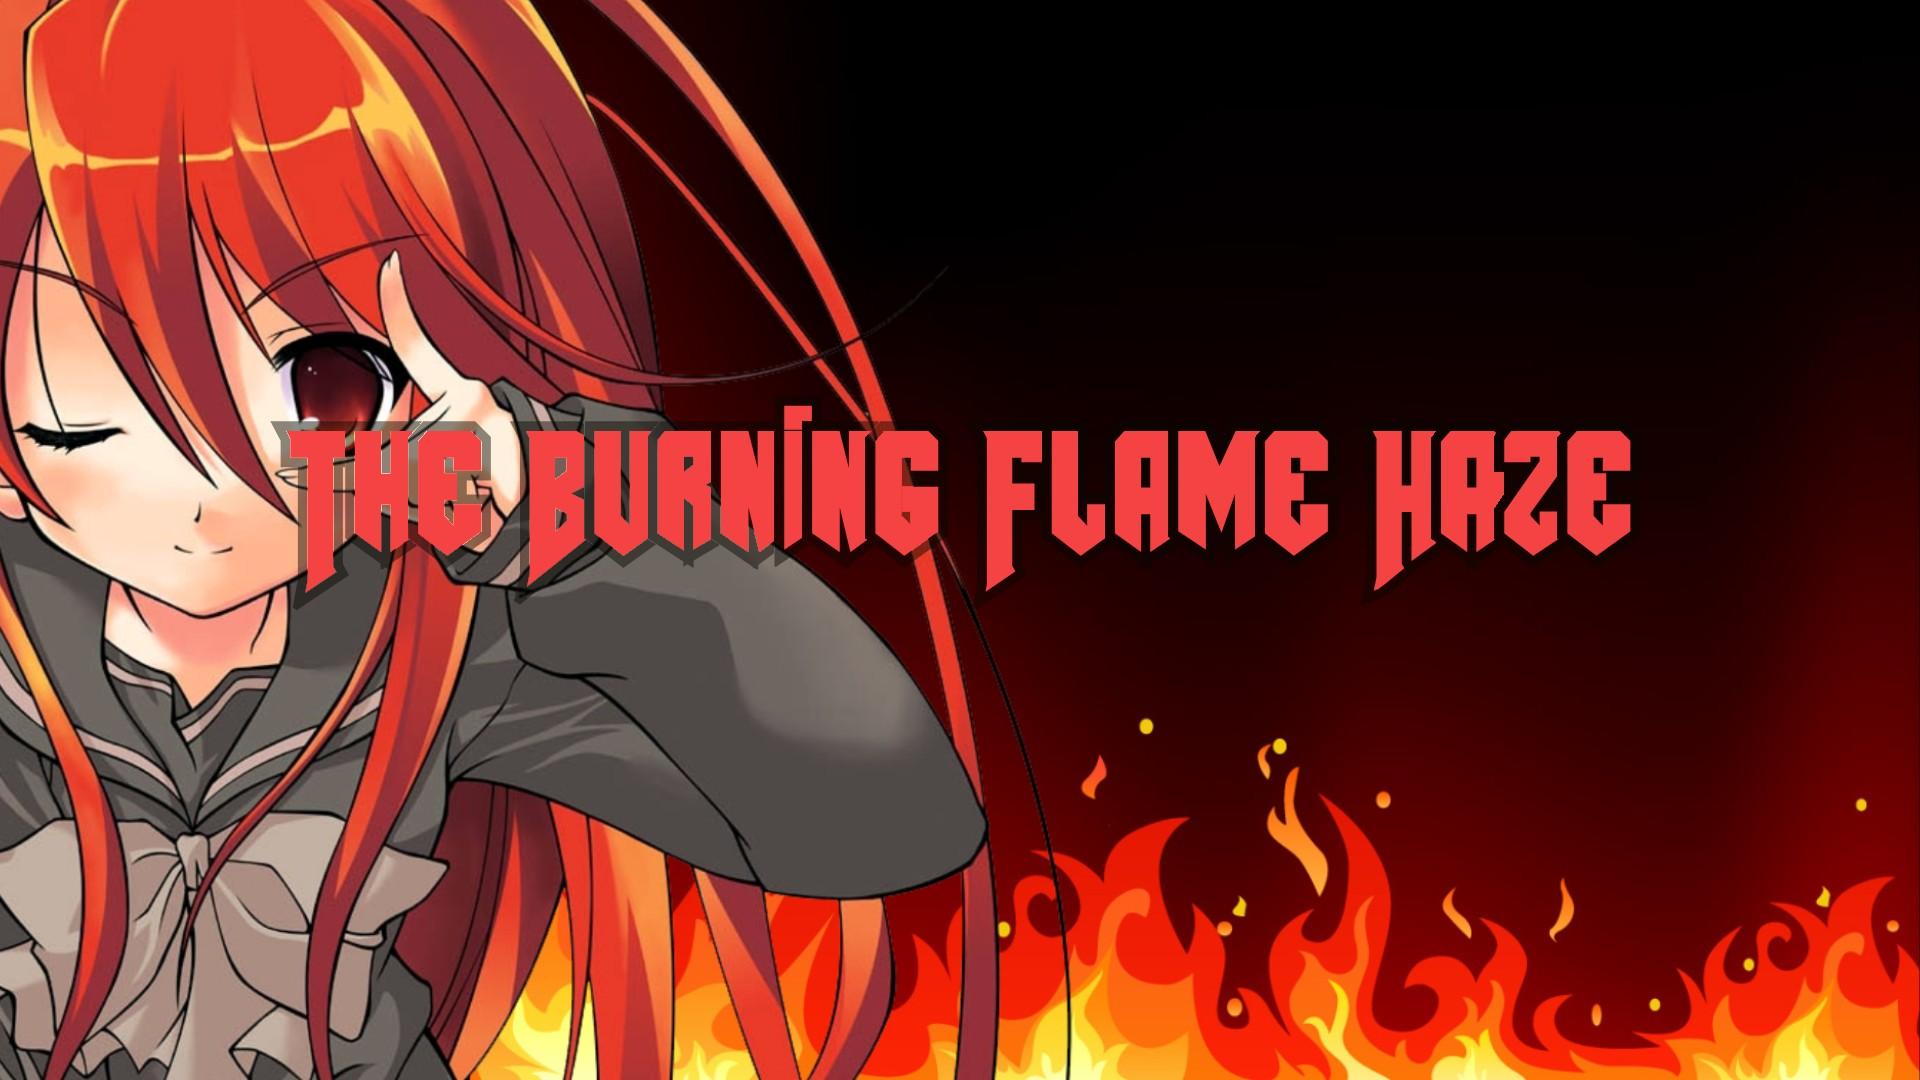 Shana, The burning Flame haze